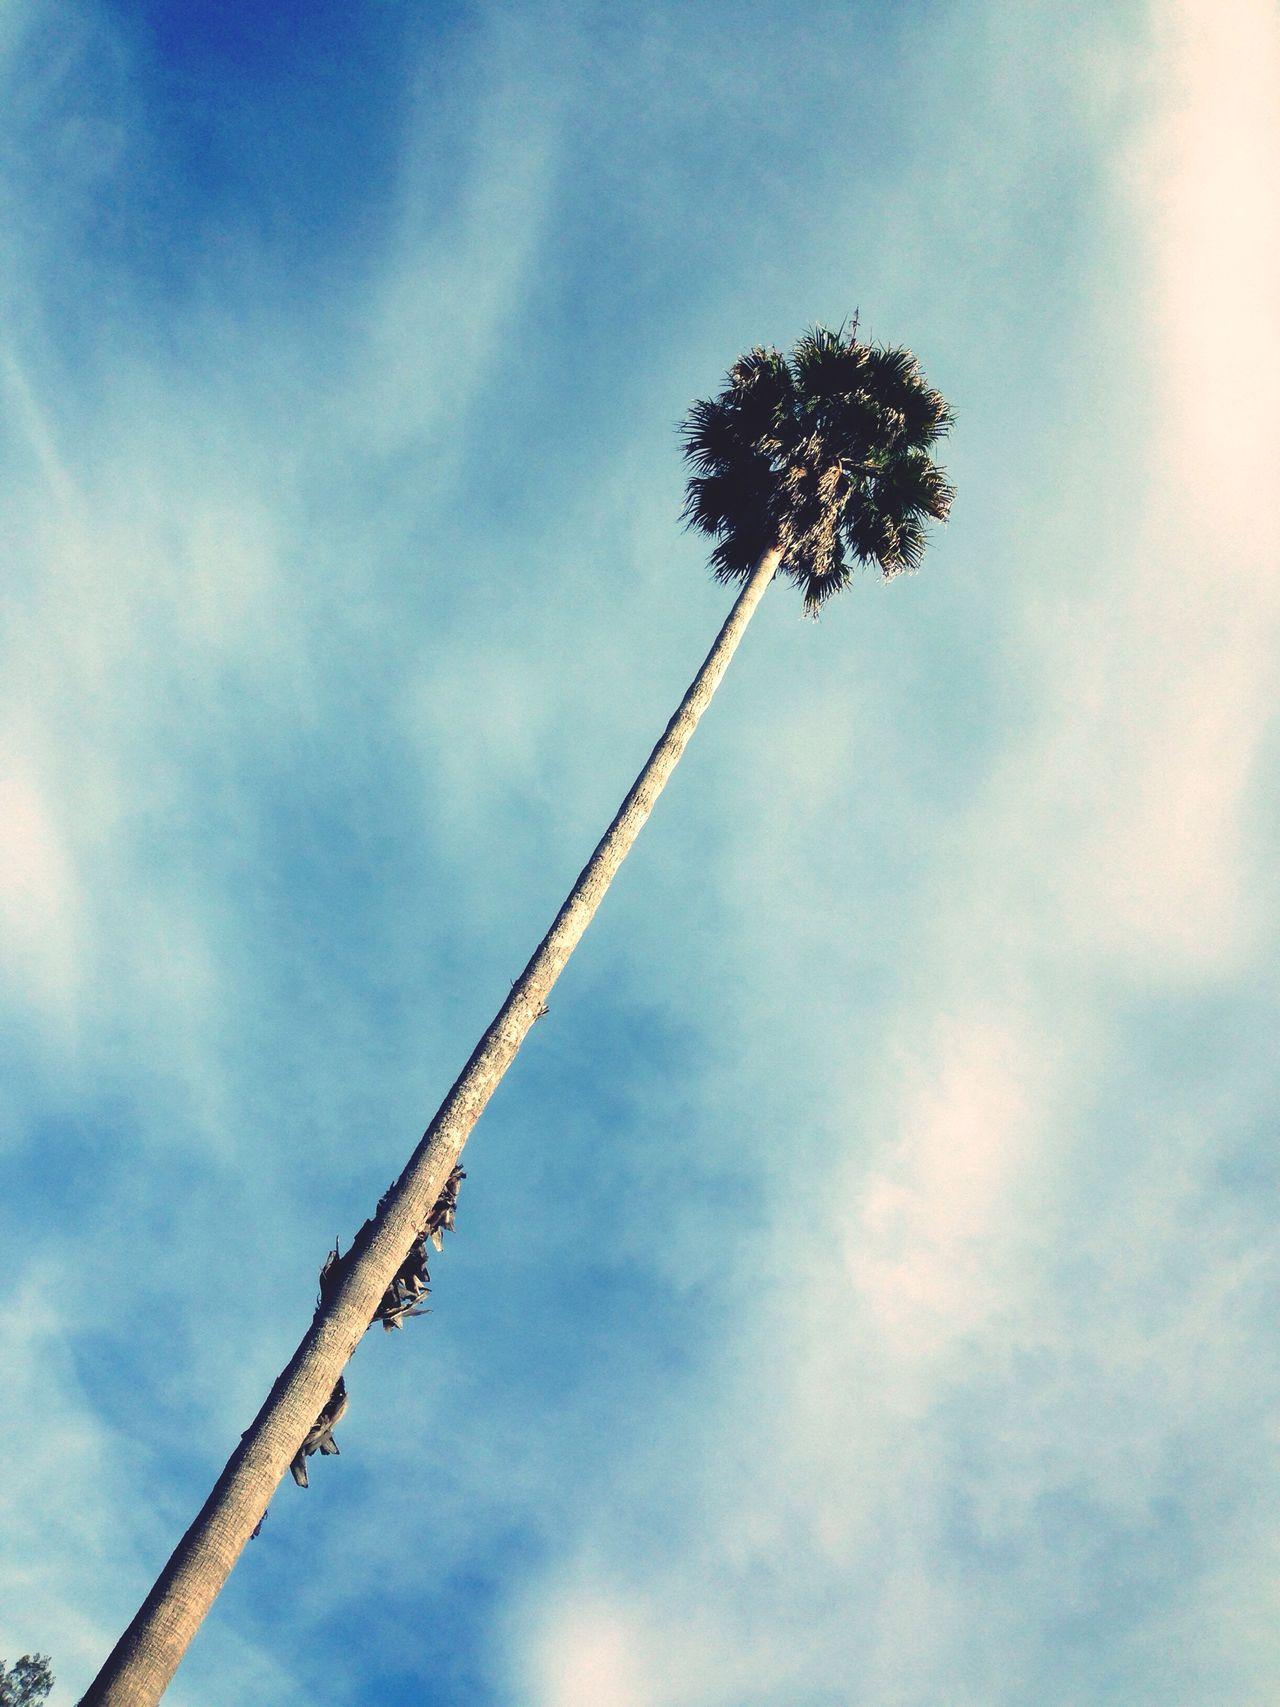 Palm Trees Blue Sky California Love California Vacation